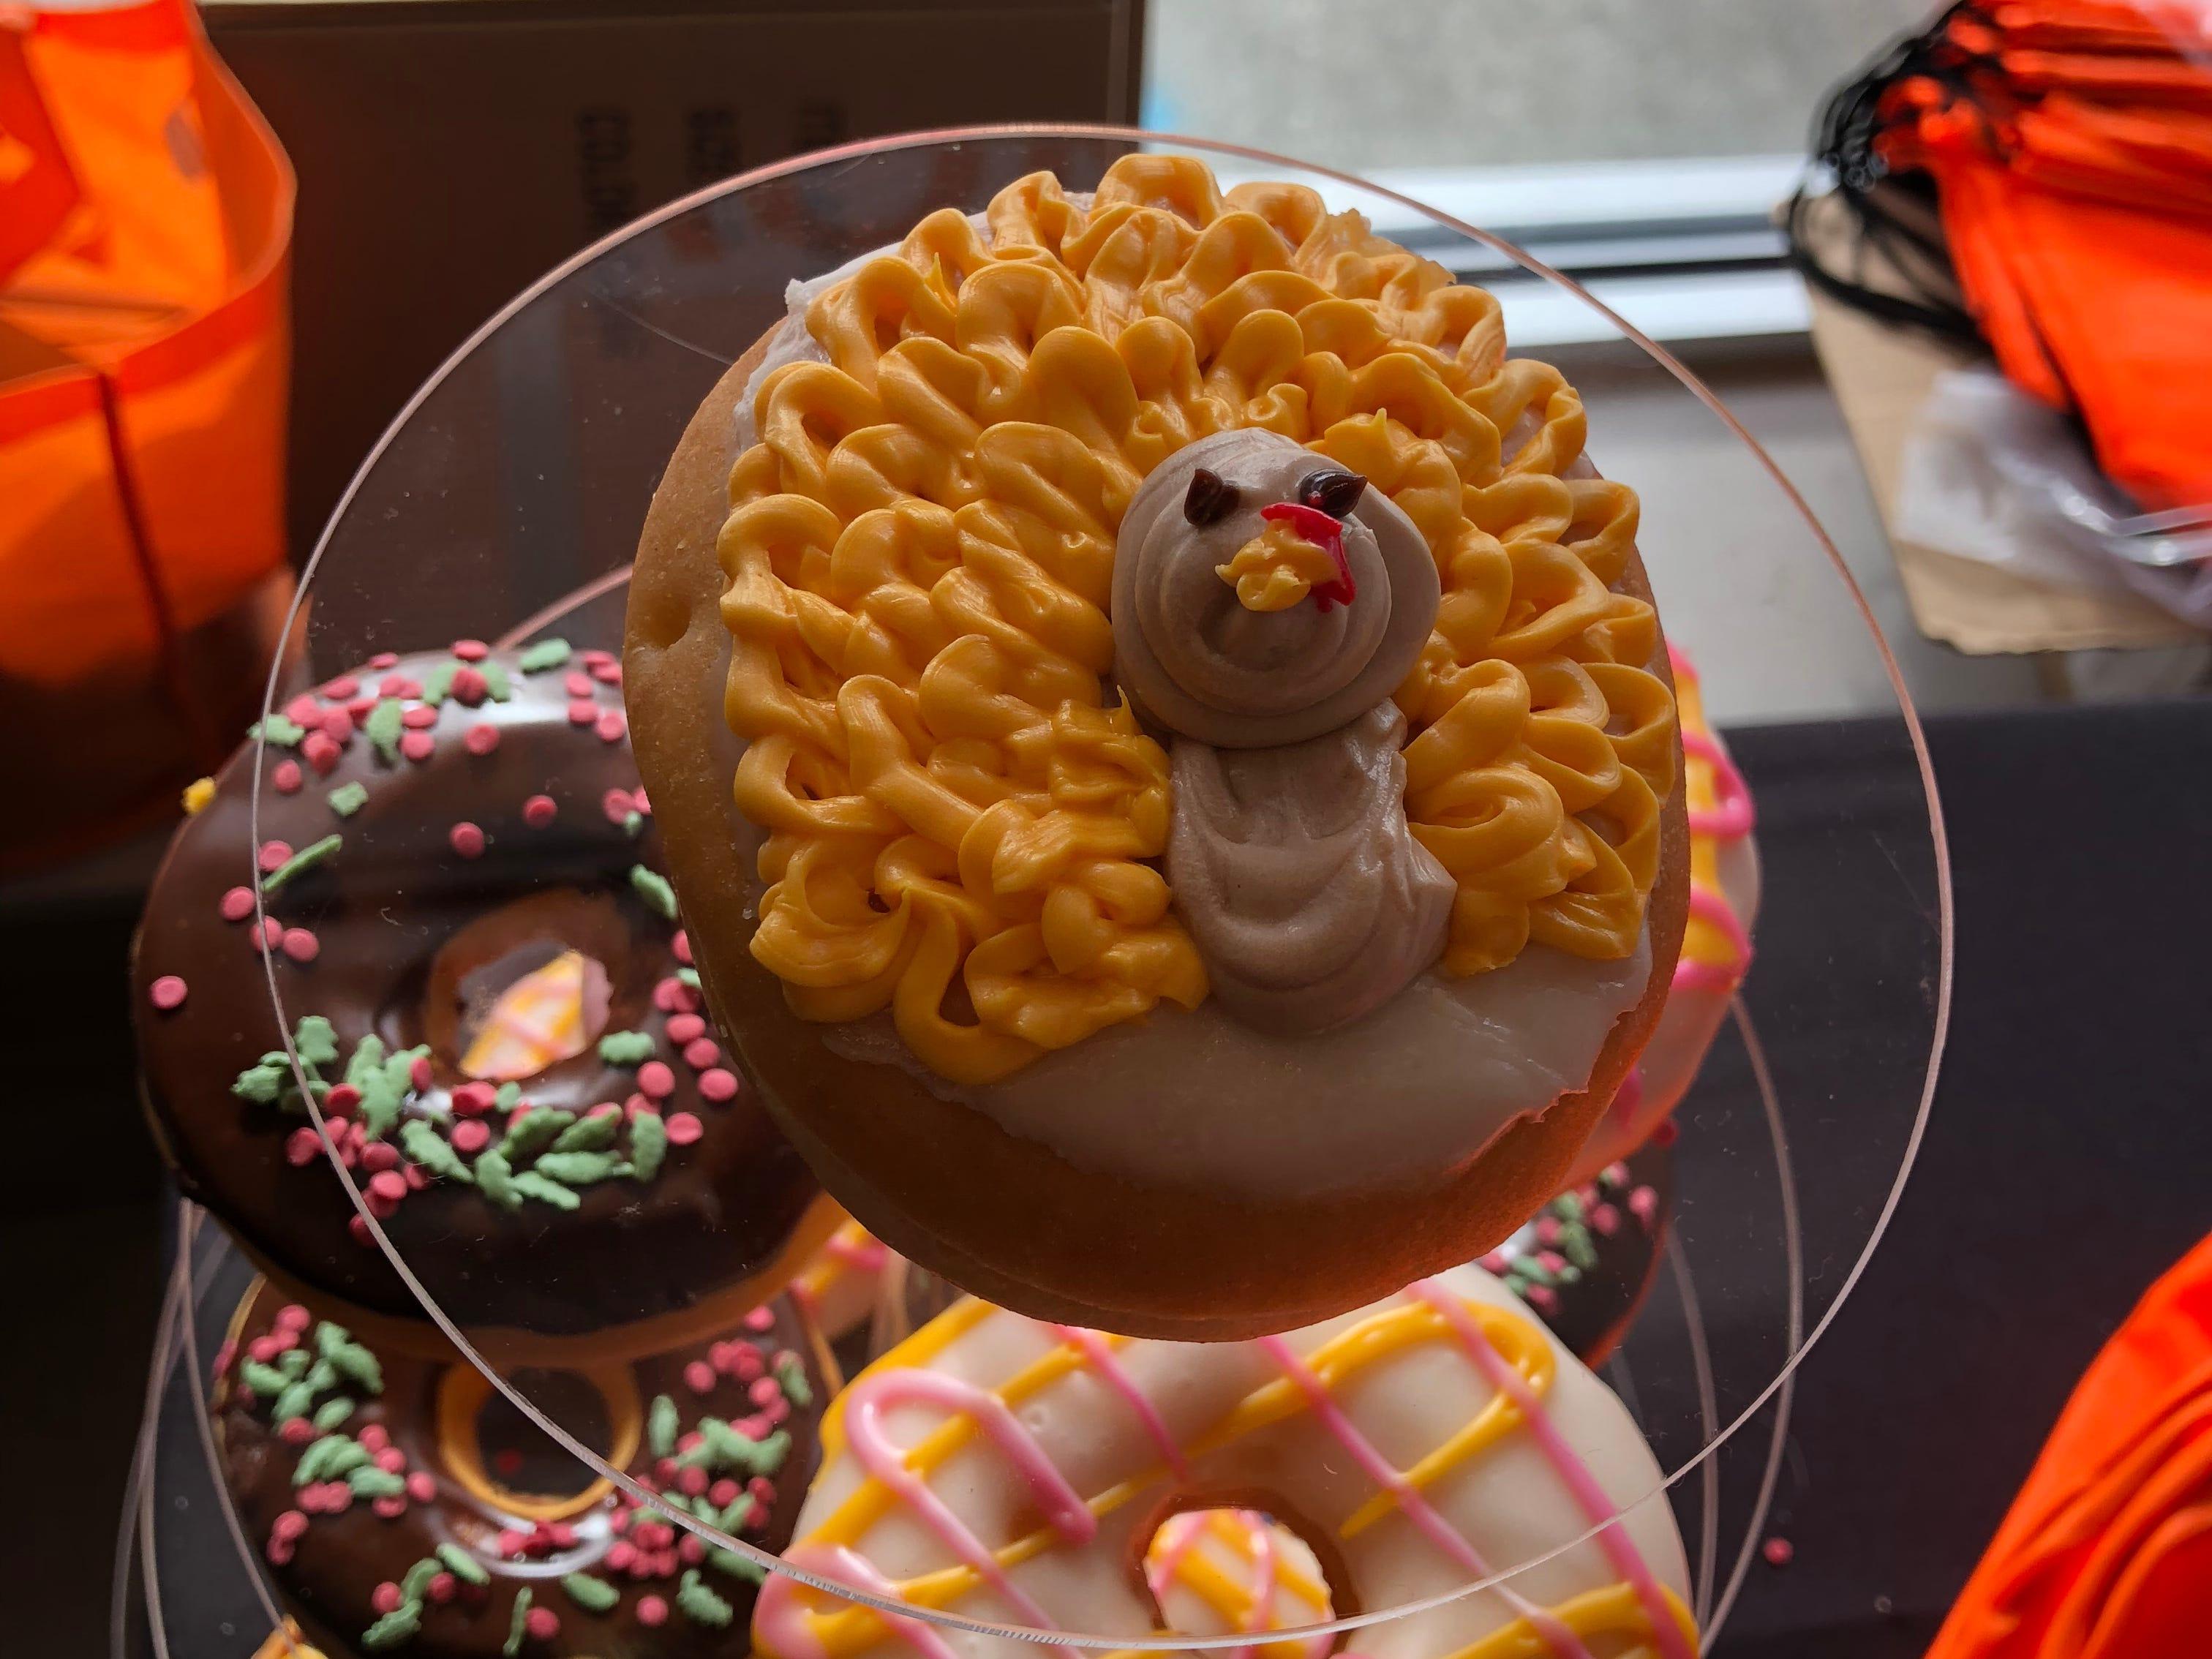 The new turkey doughnut at Dunkin'/DD in Hartsdale.